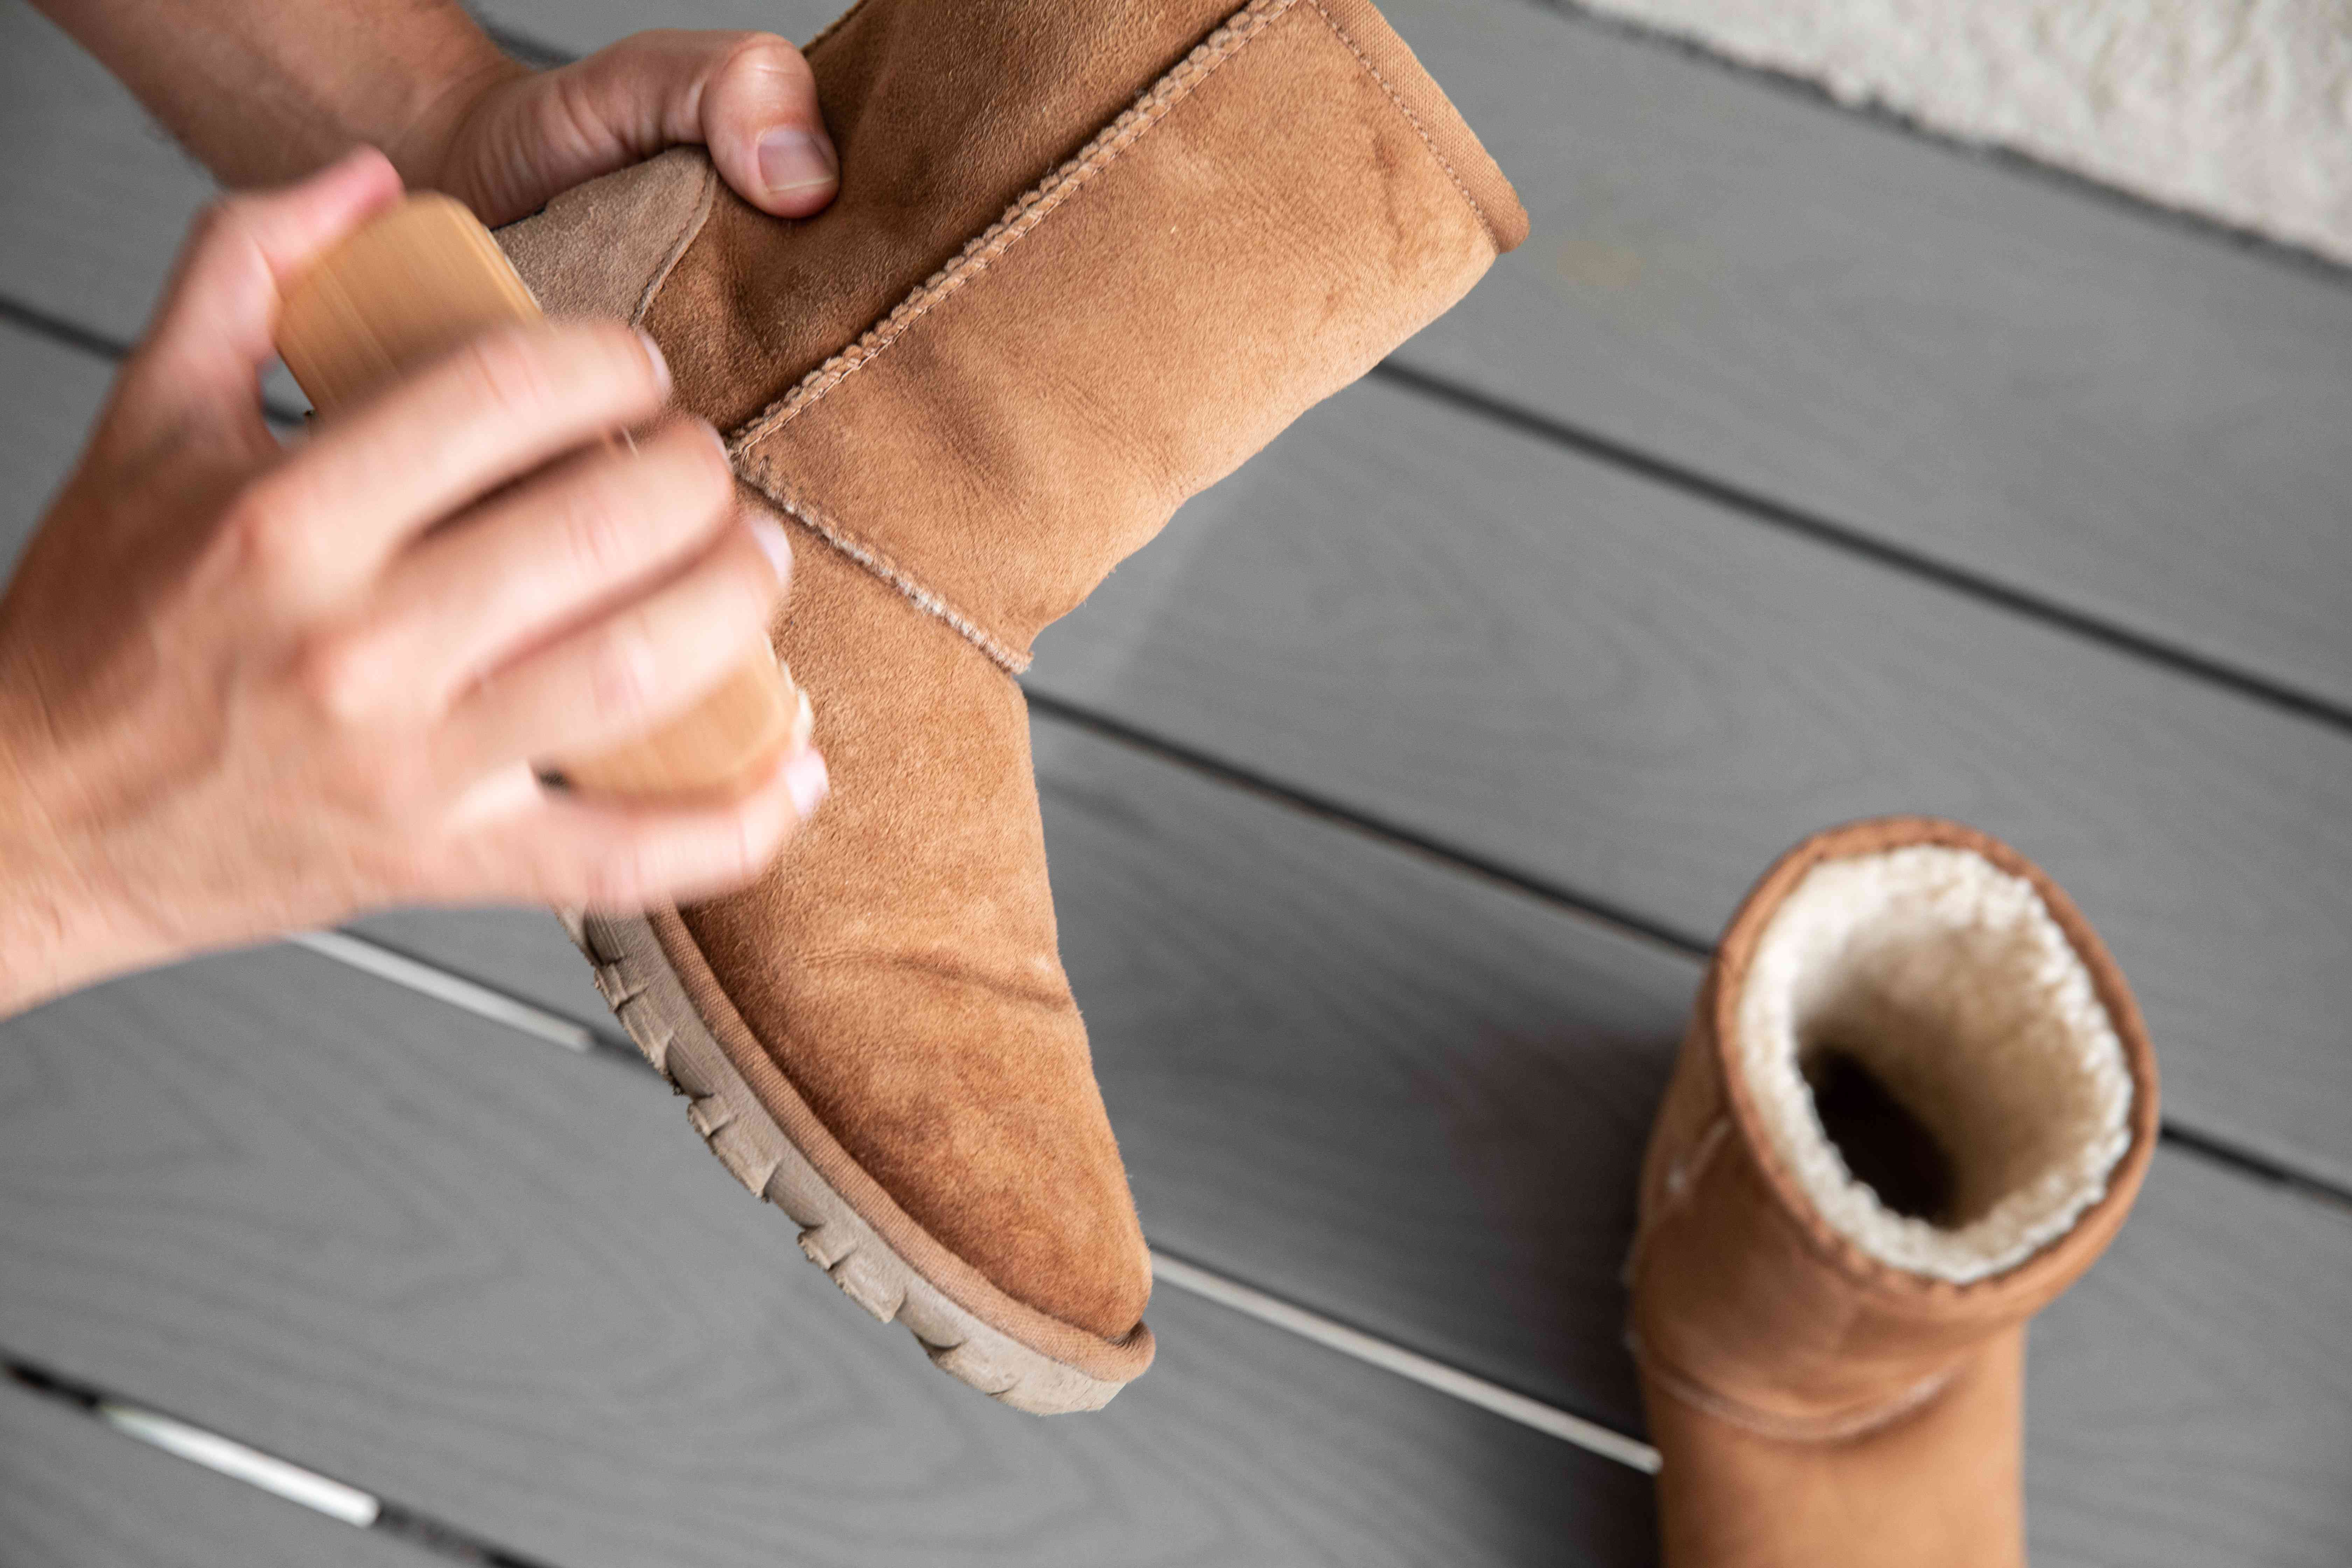 Someone brushing Ugg boots